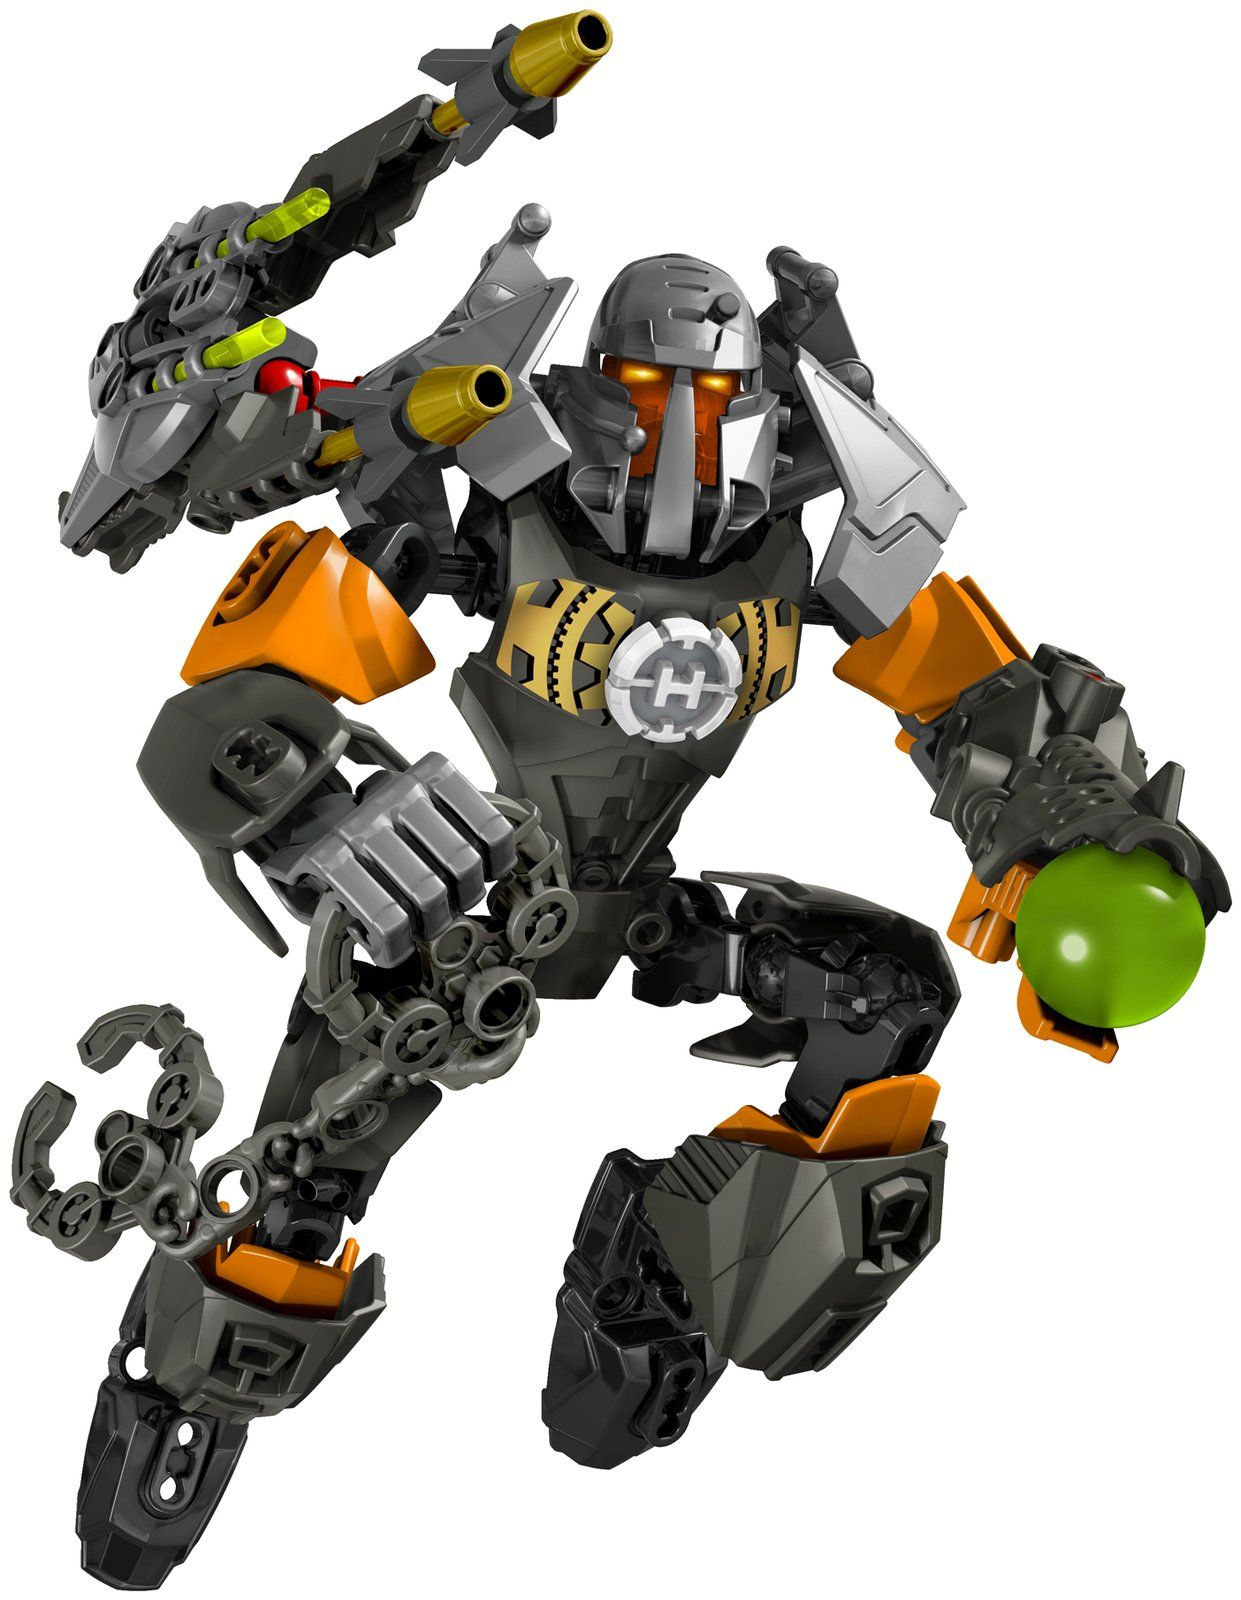 Hero Factory Villains Lego Hero Factory Villains Hero Factory